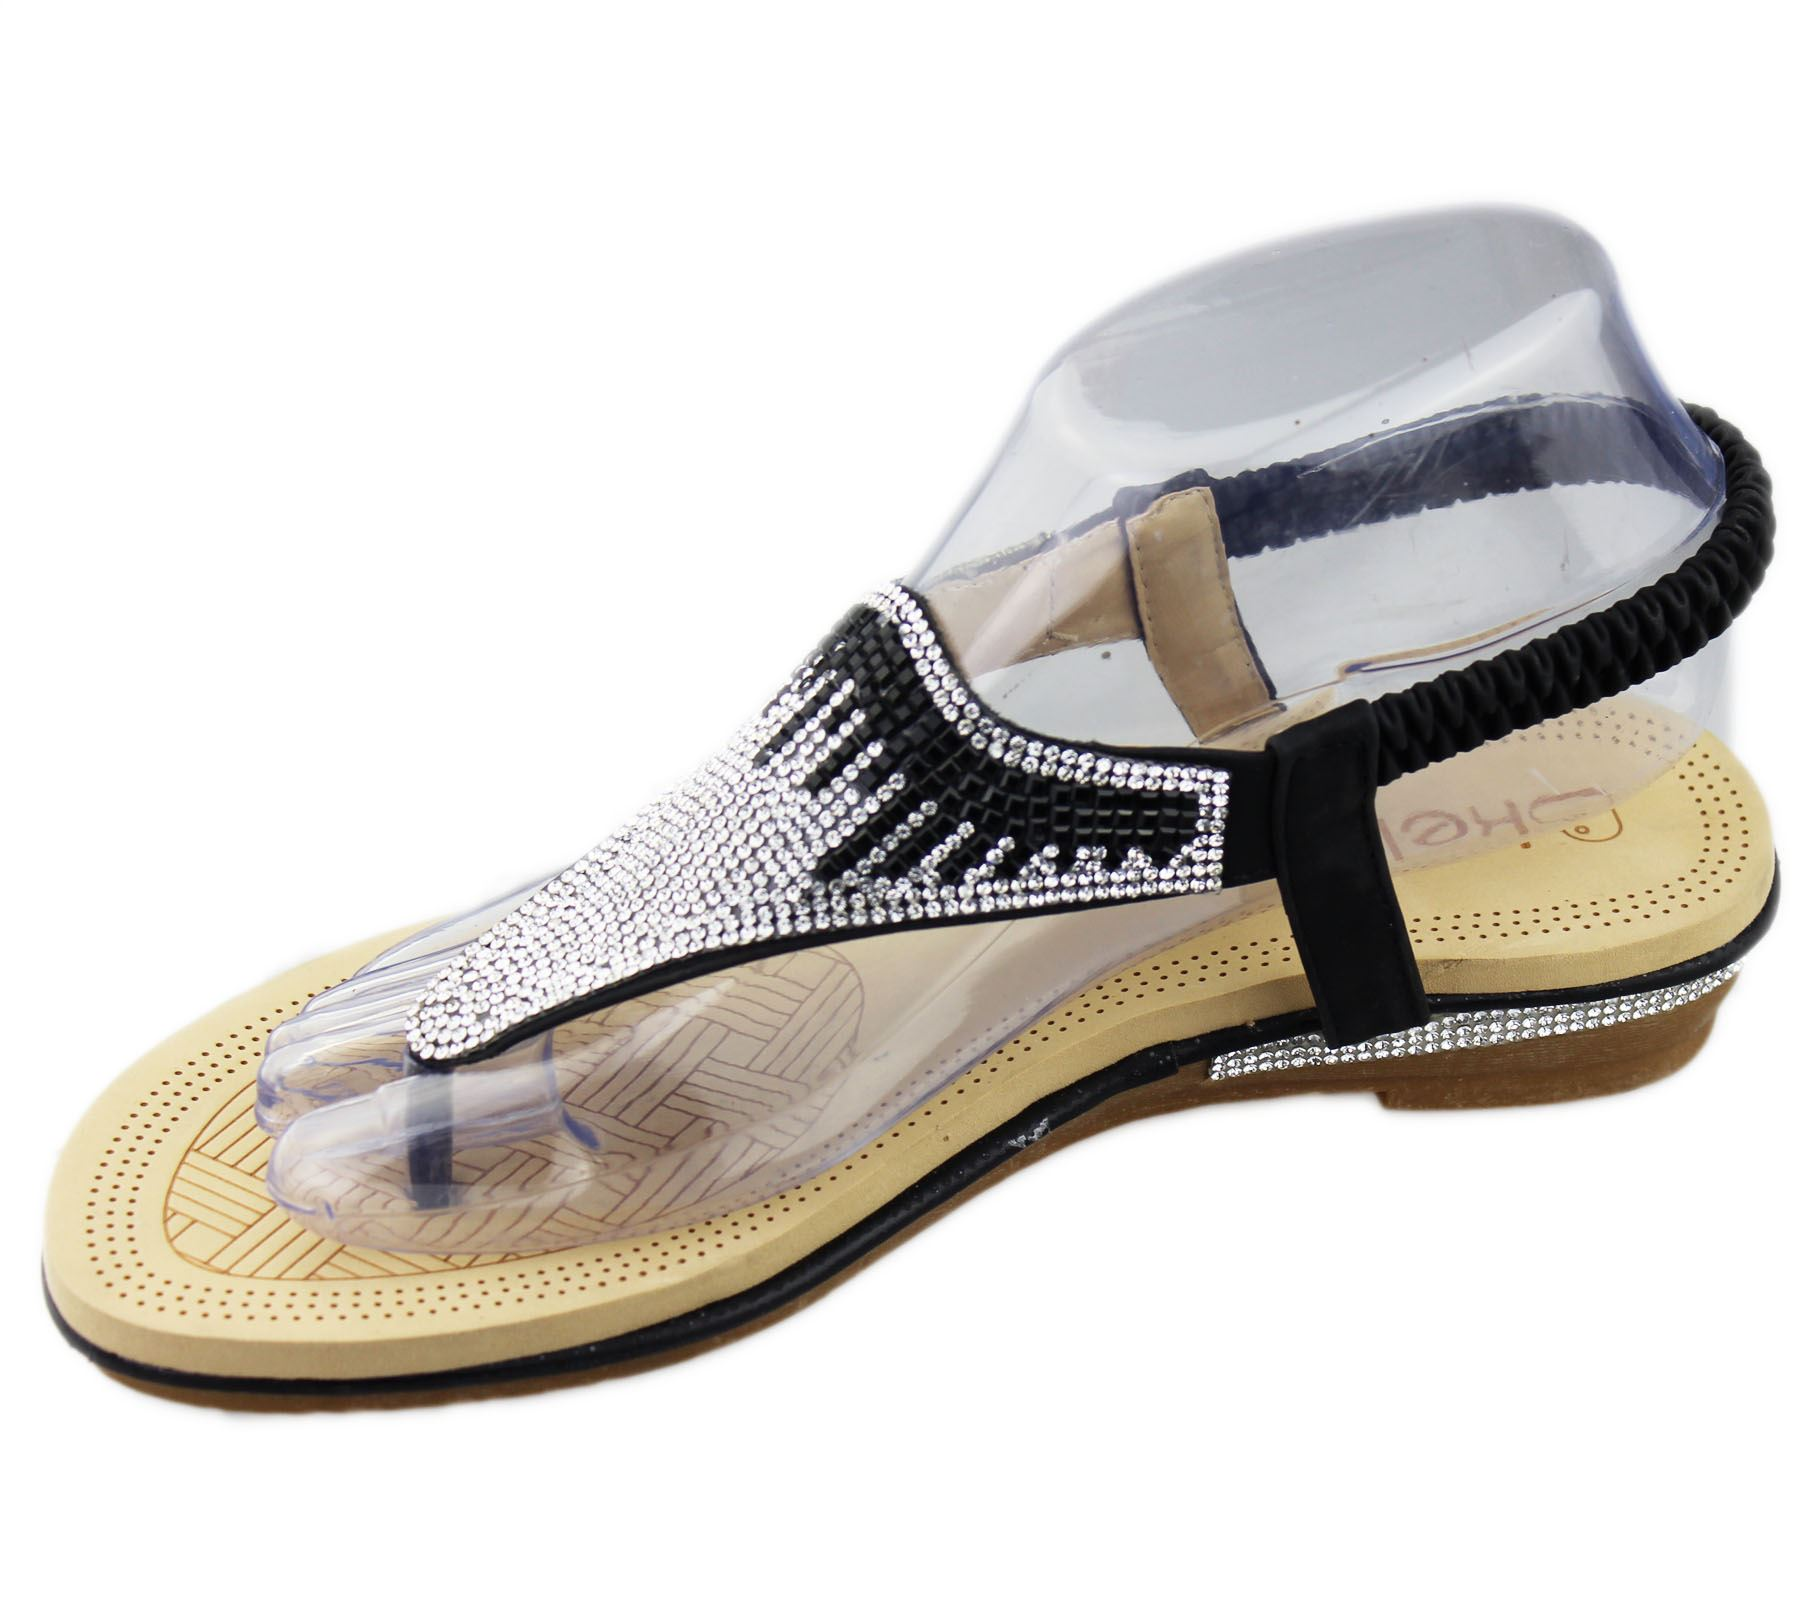 Womens-Flat-Sandals-Ladies-Diamante-Toe-Post-Summer-Wedding-Soft-Sole-Shoes thumbnail 4